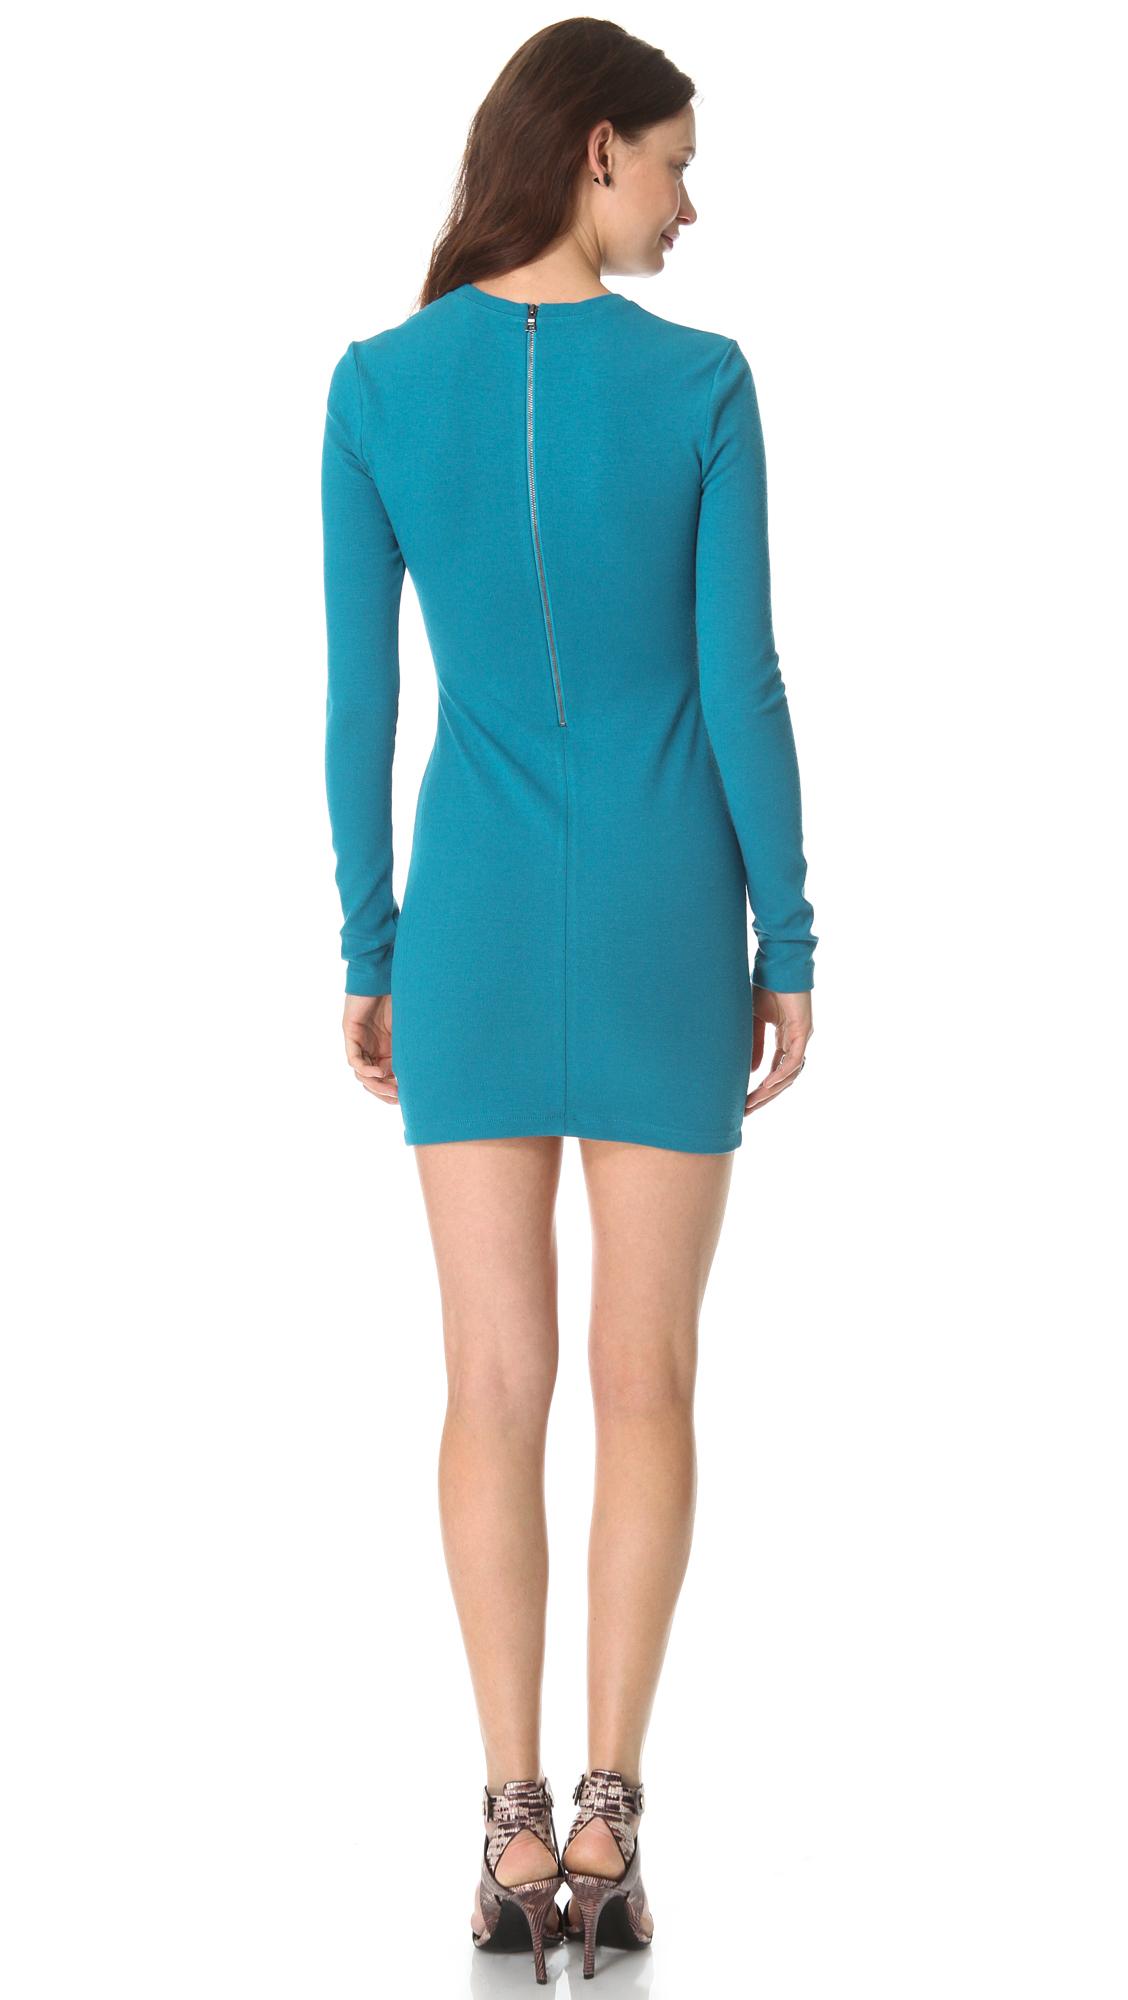 1ced1df1717 Kimberly Ovitz Aisu Dress